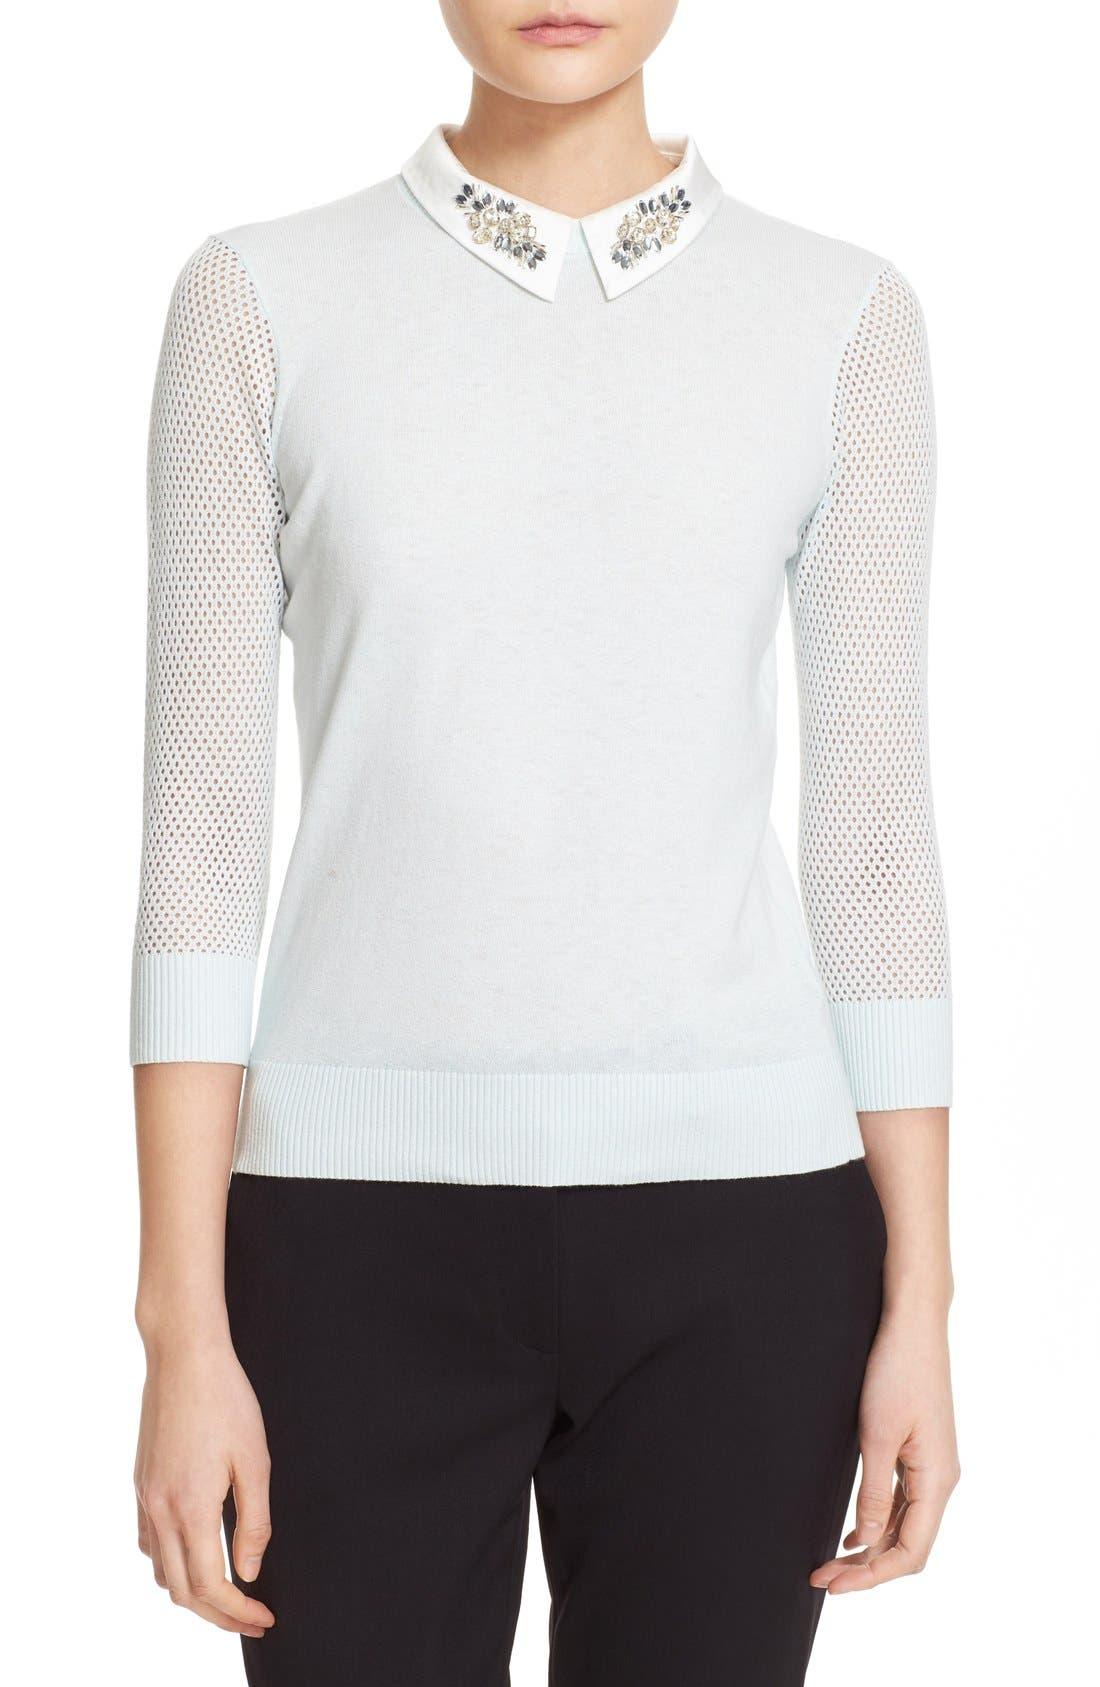 Main Image - Ted Baker London Embellished Collar Mesh Sleeve Sweater